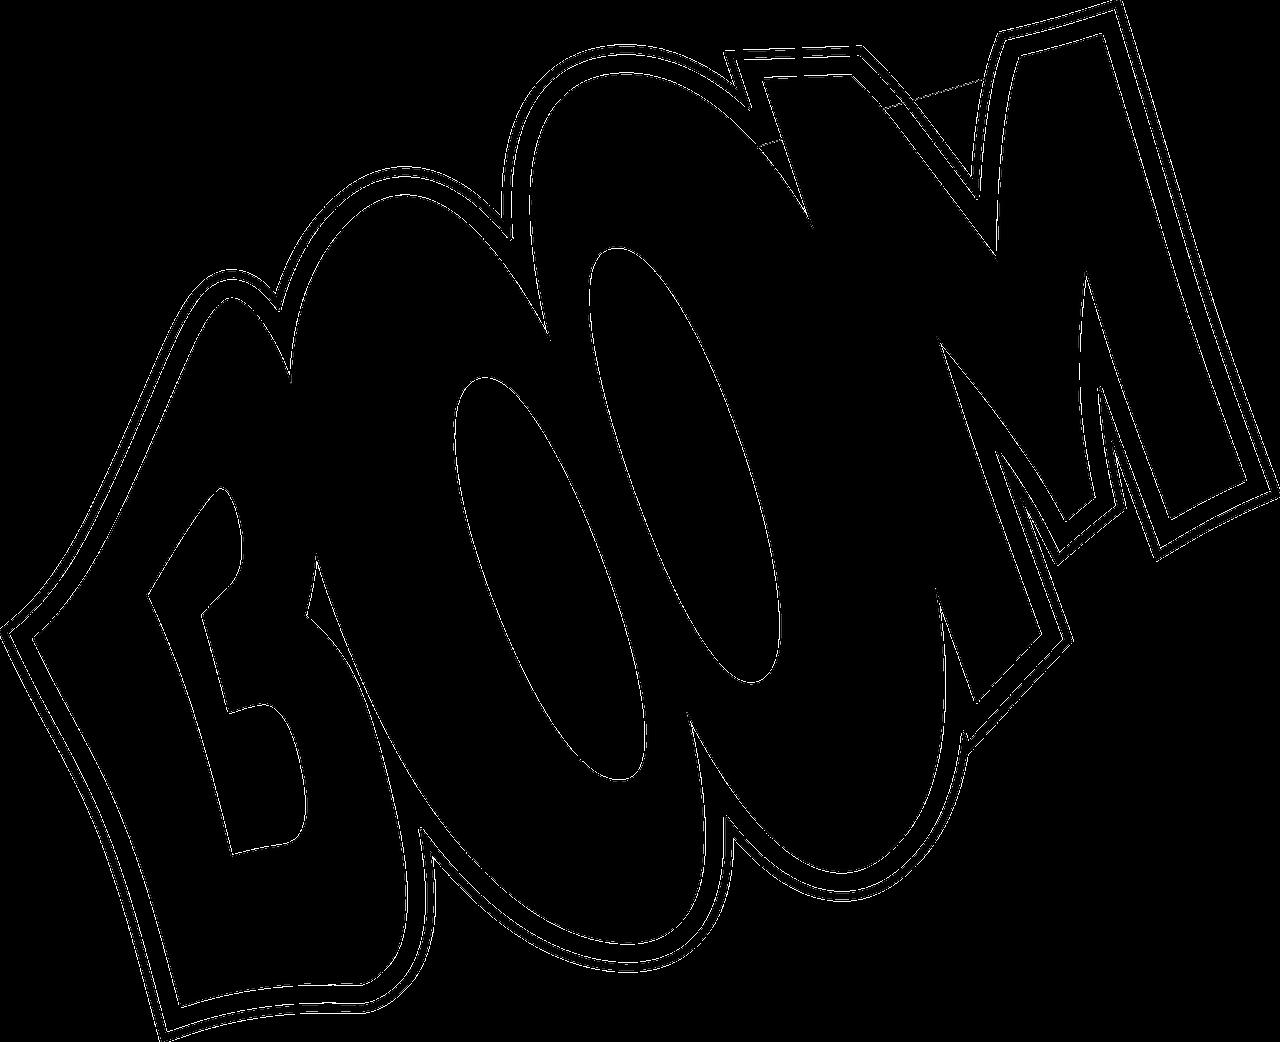 Preto Branco Explosao Grafico Vetorial Gratis No Pixabay